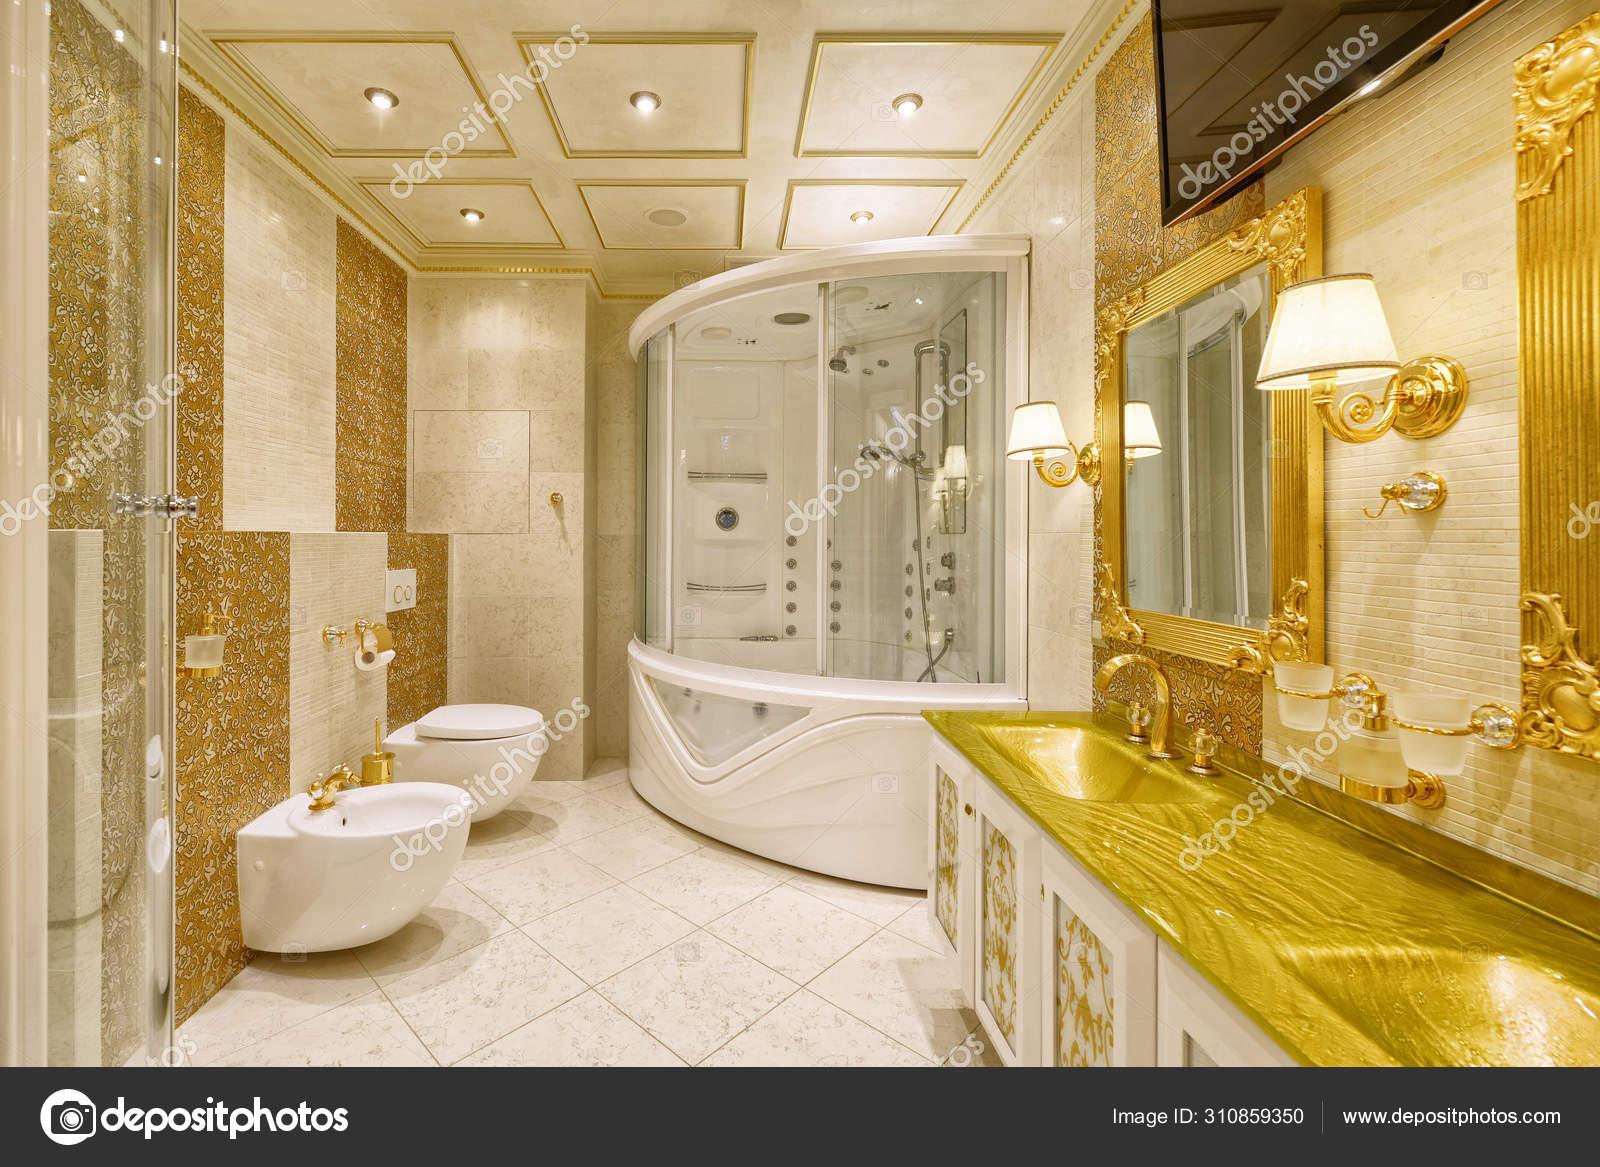 Luxurious Interiors Modern House Interior Design Stylish Bathroom Luxury House Stock Photo Image By C Ovchinnikovfoto 310859350